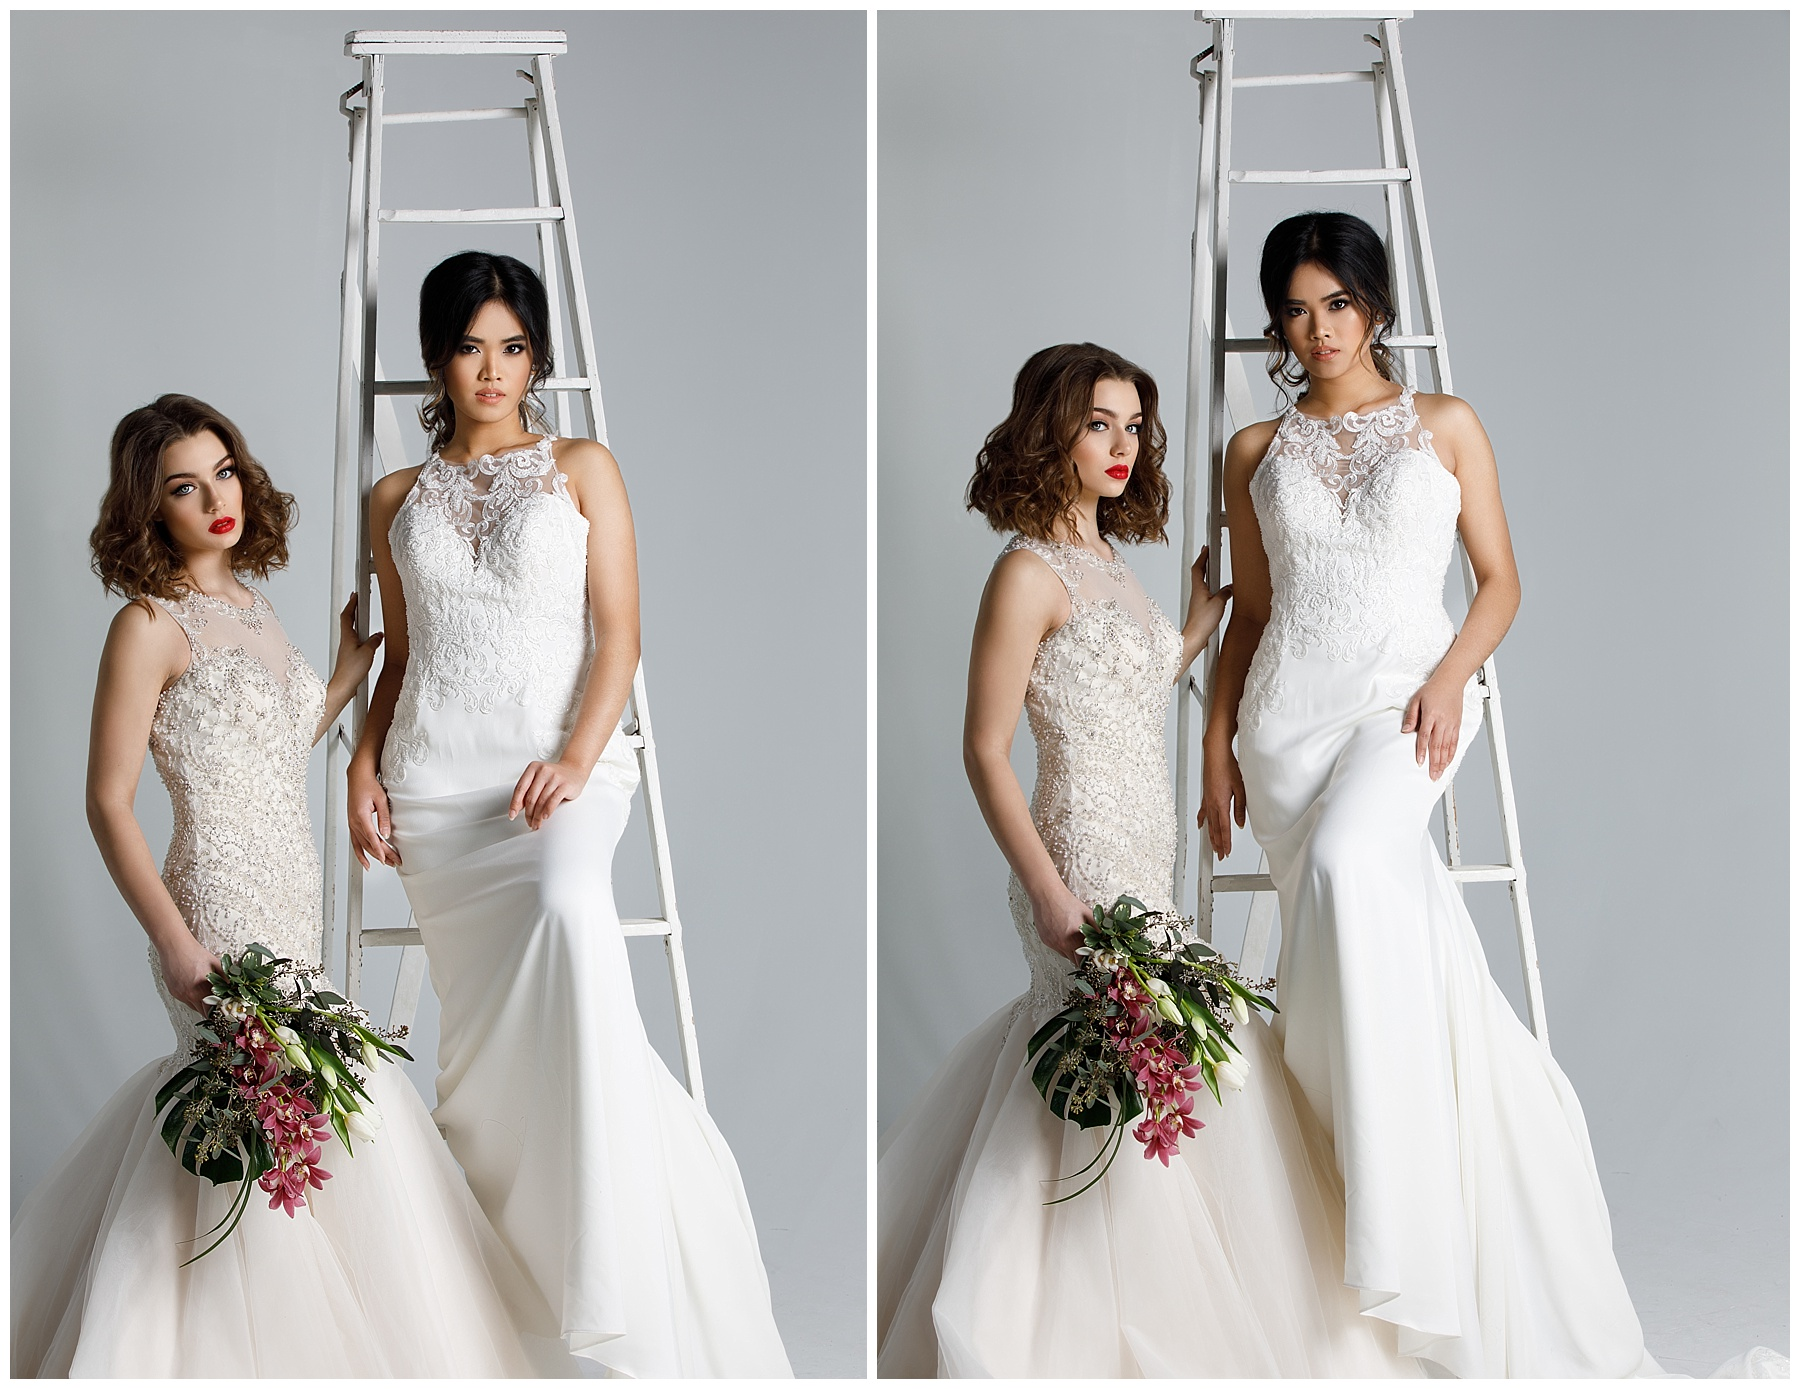 beauty photographers